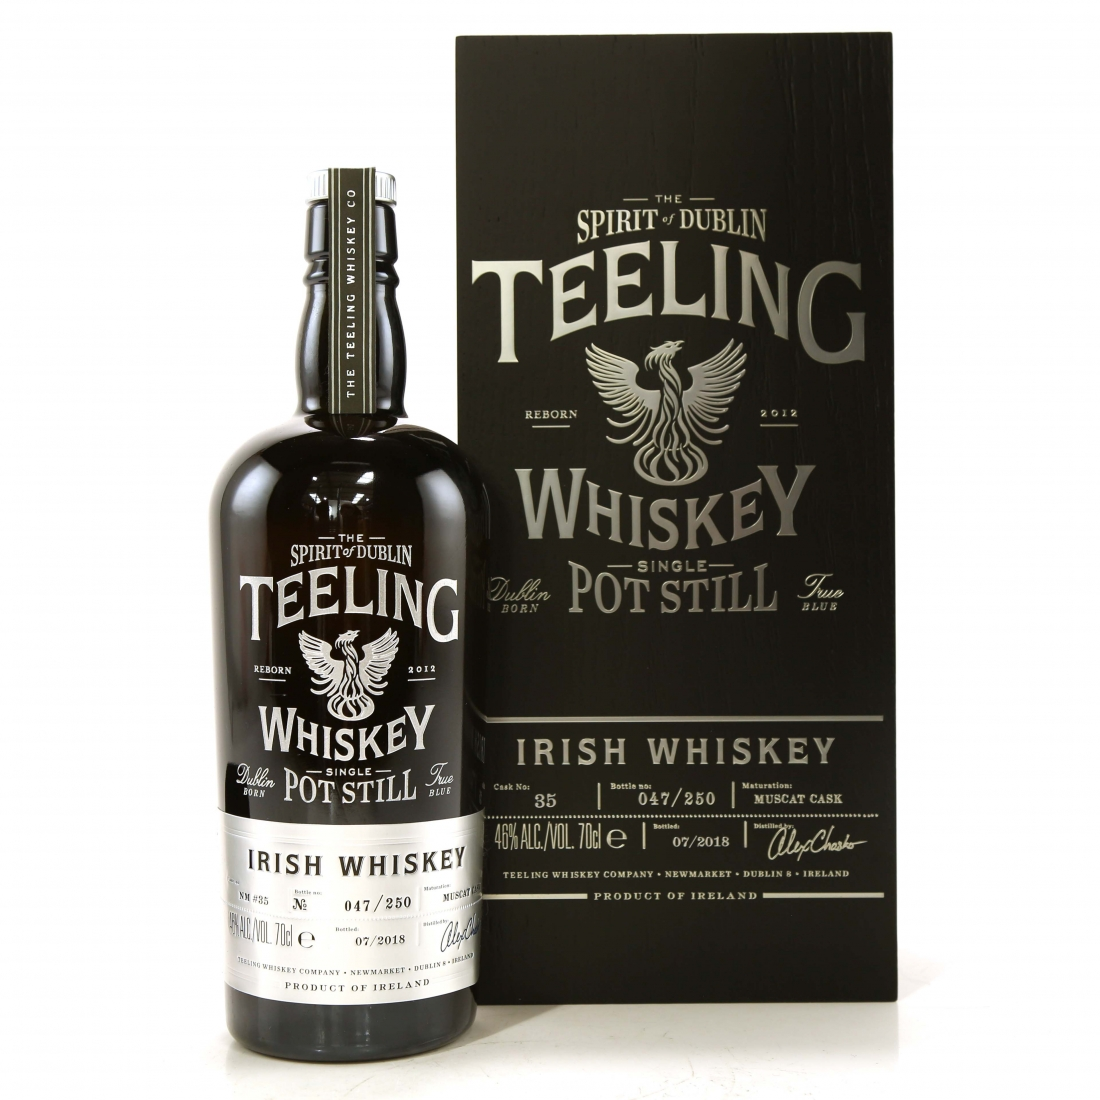 Teeling Celebratory Single Pot Still Whiskey / Bottle #047